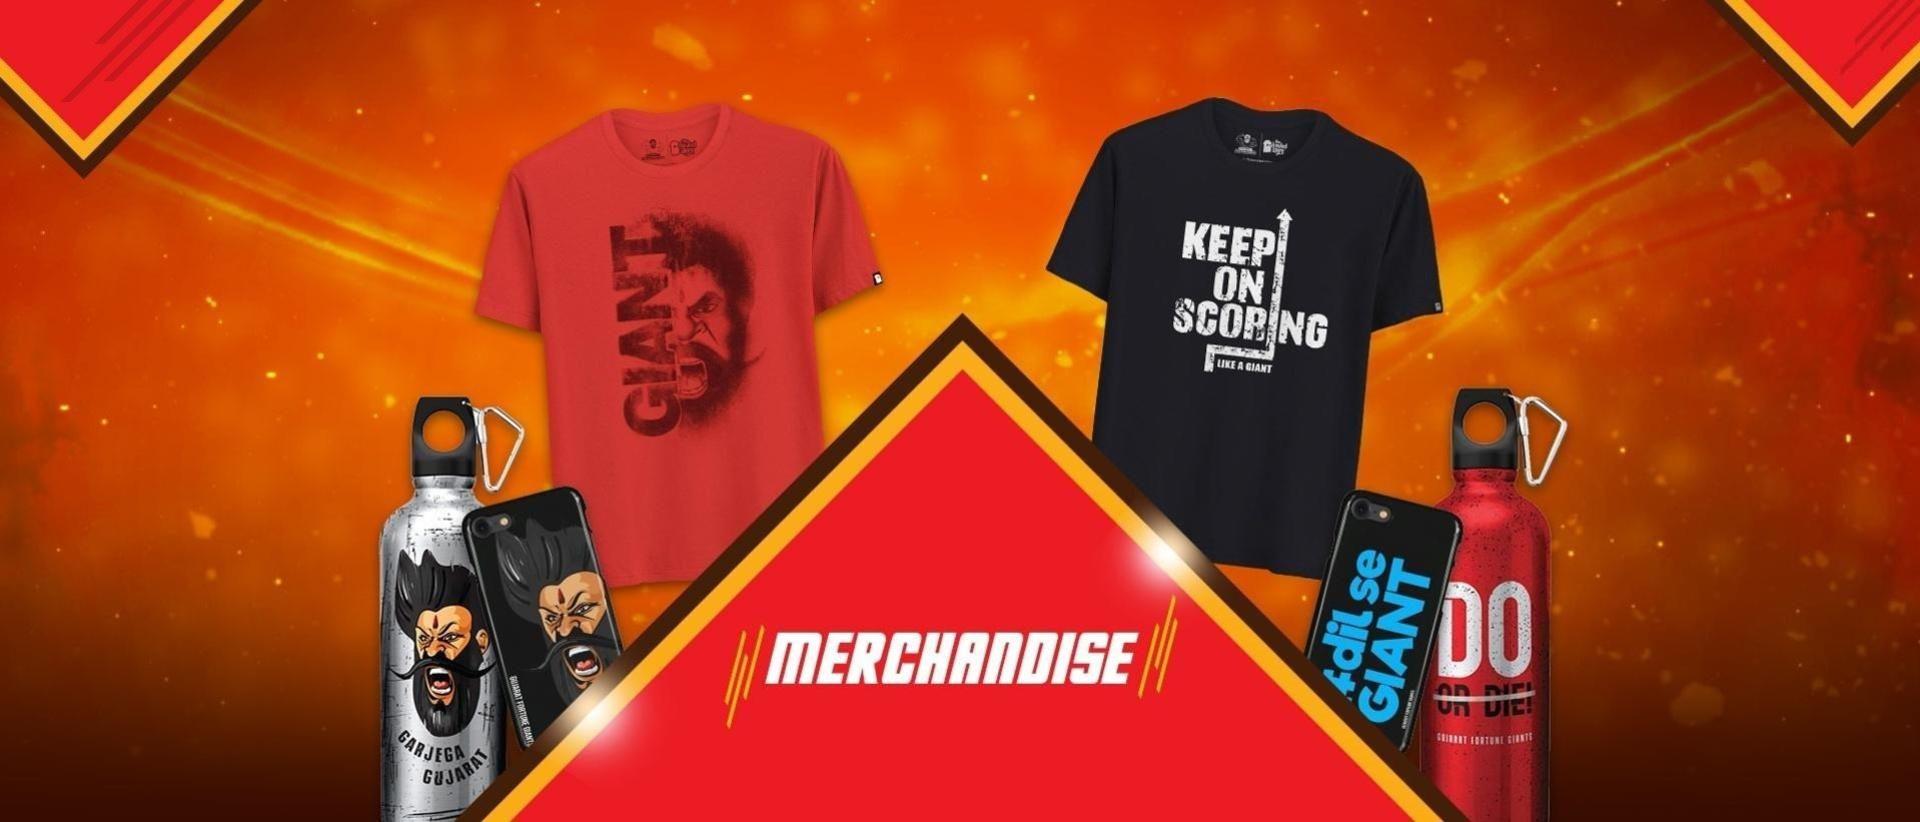 Merchandise]